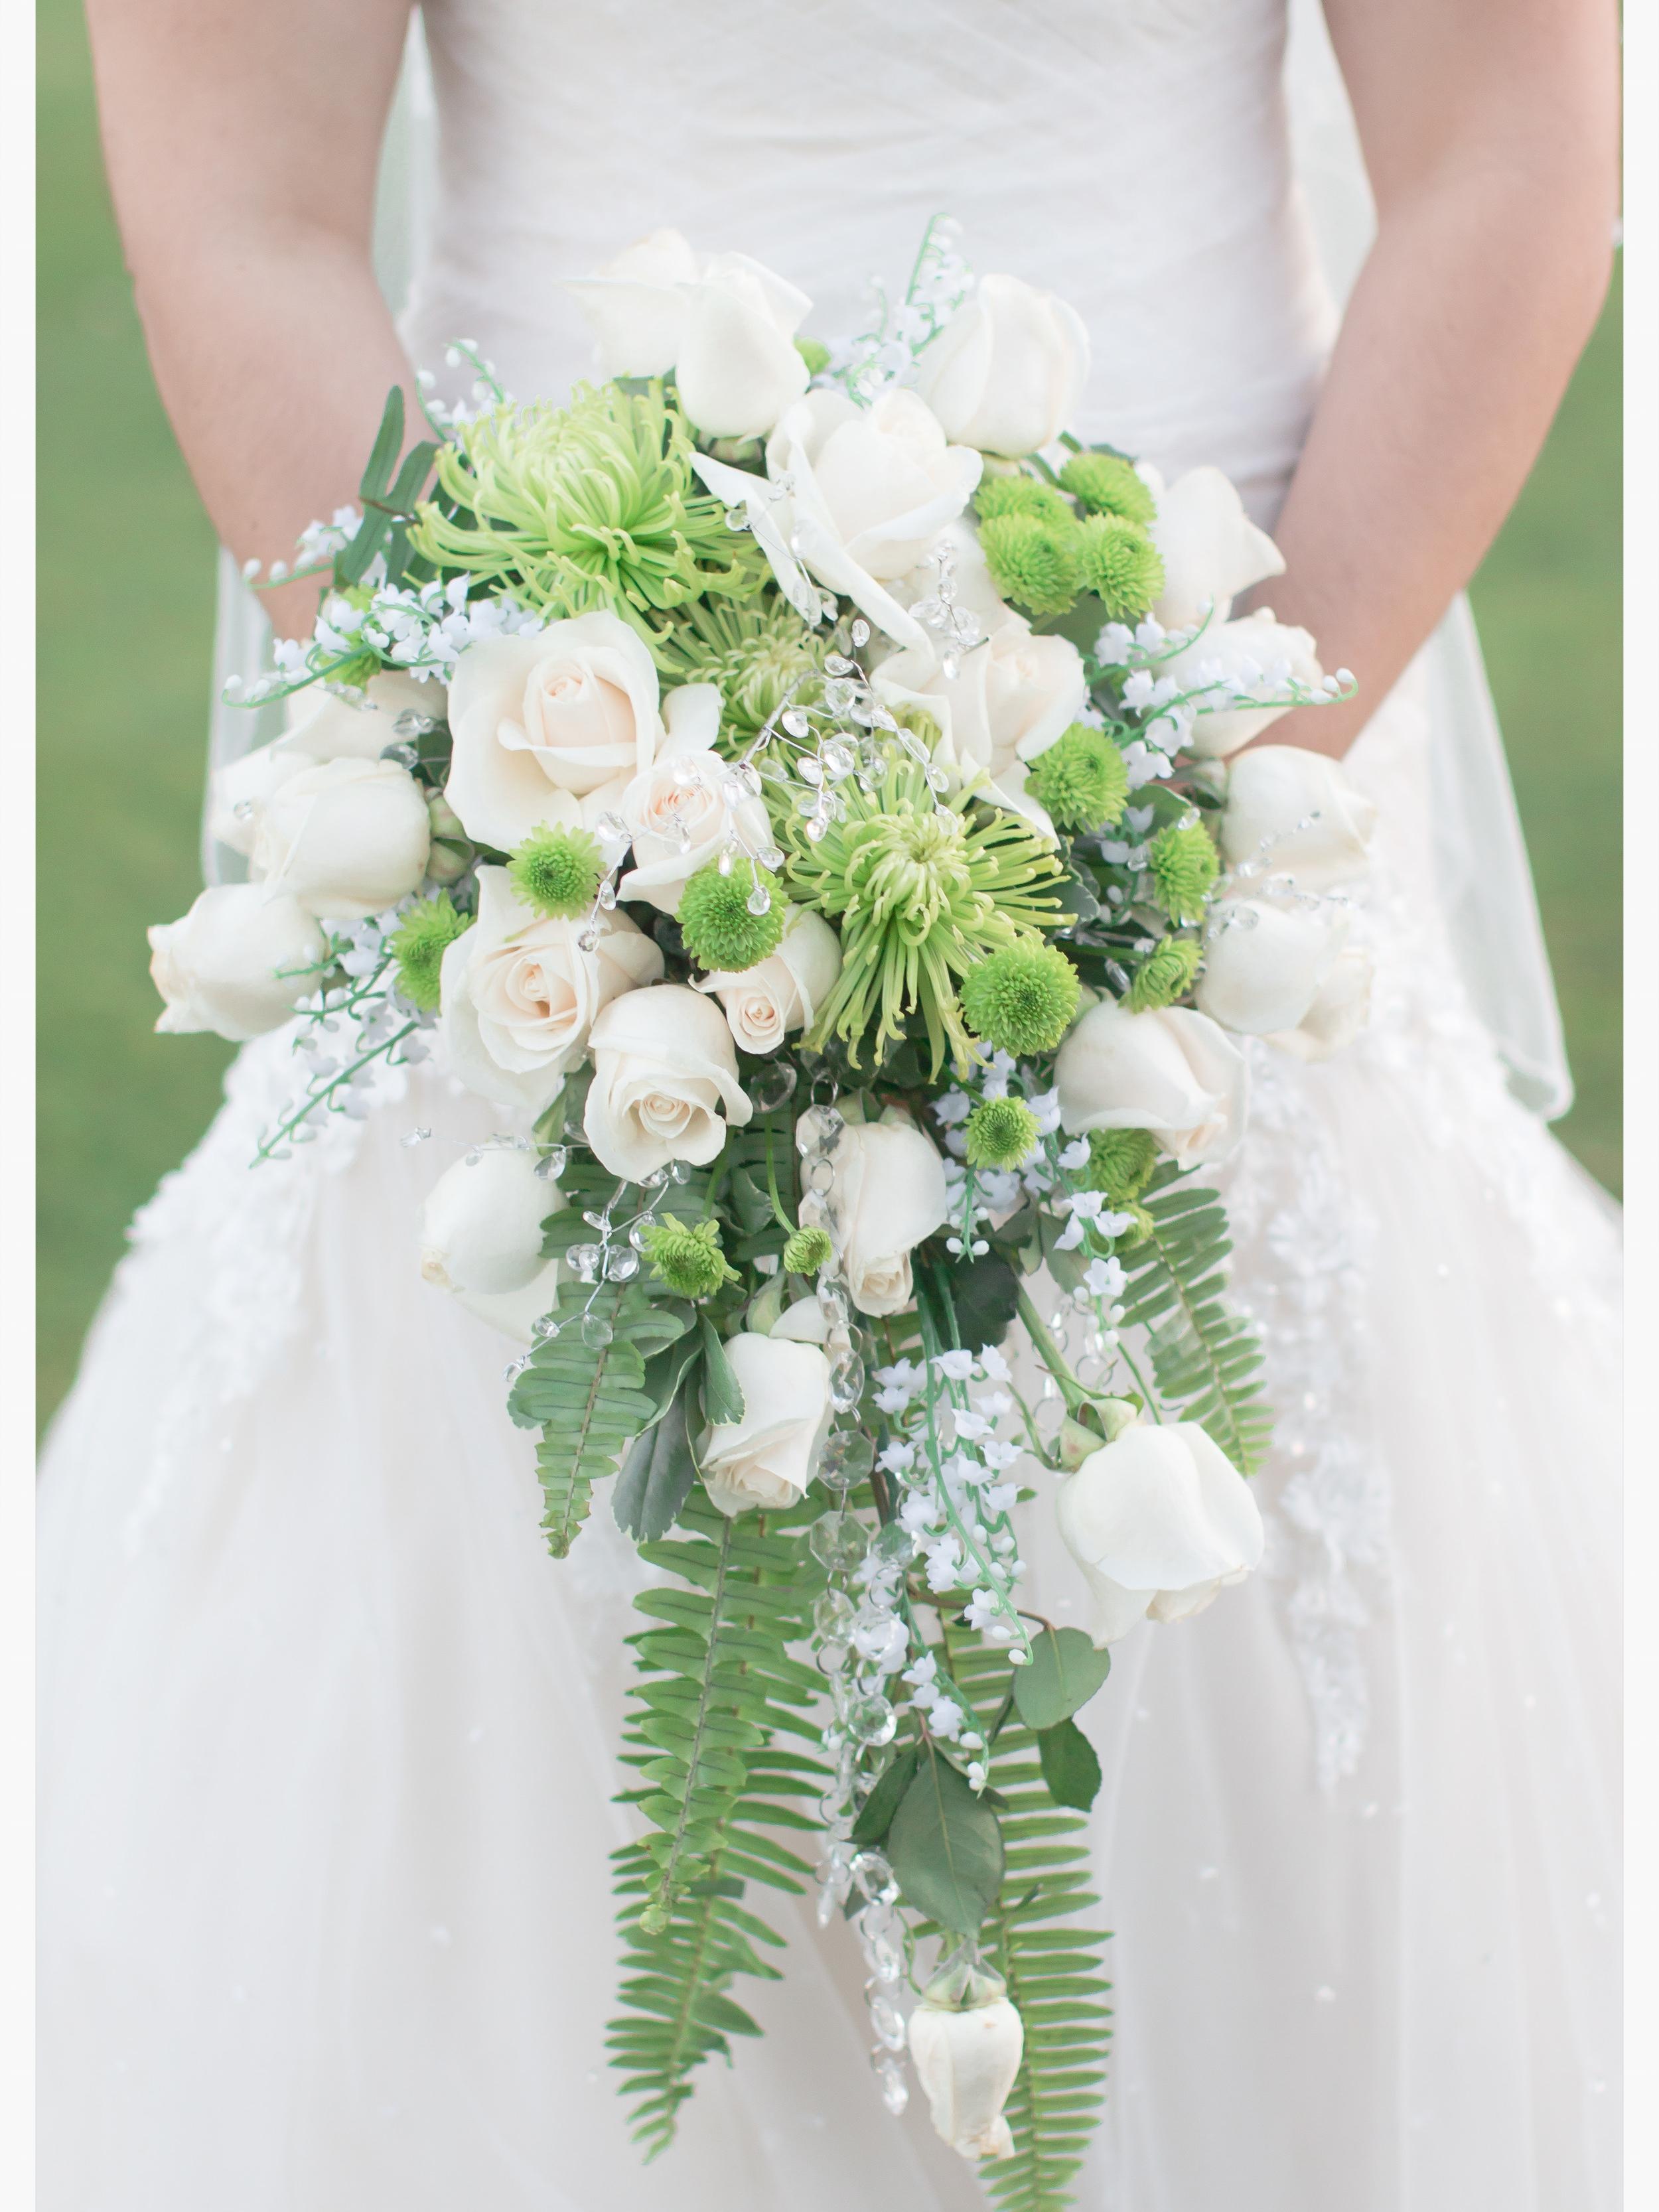 Lehigh Valley Wedding Photographer | Workflow